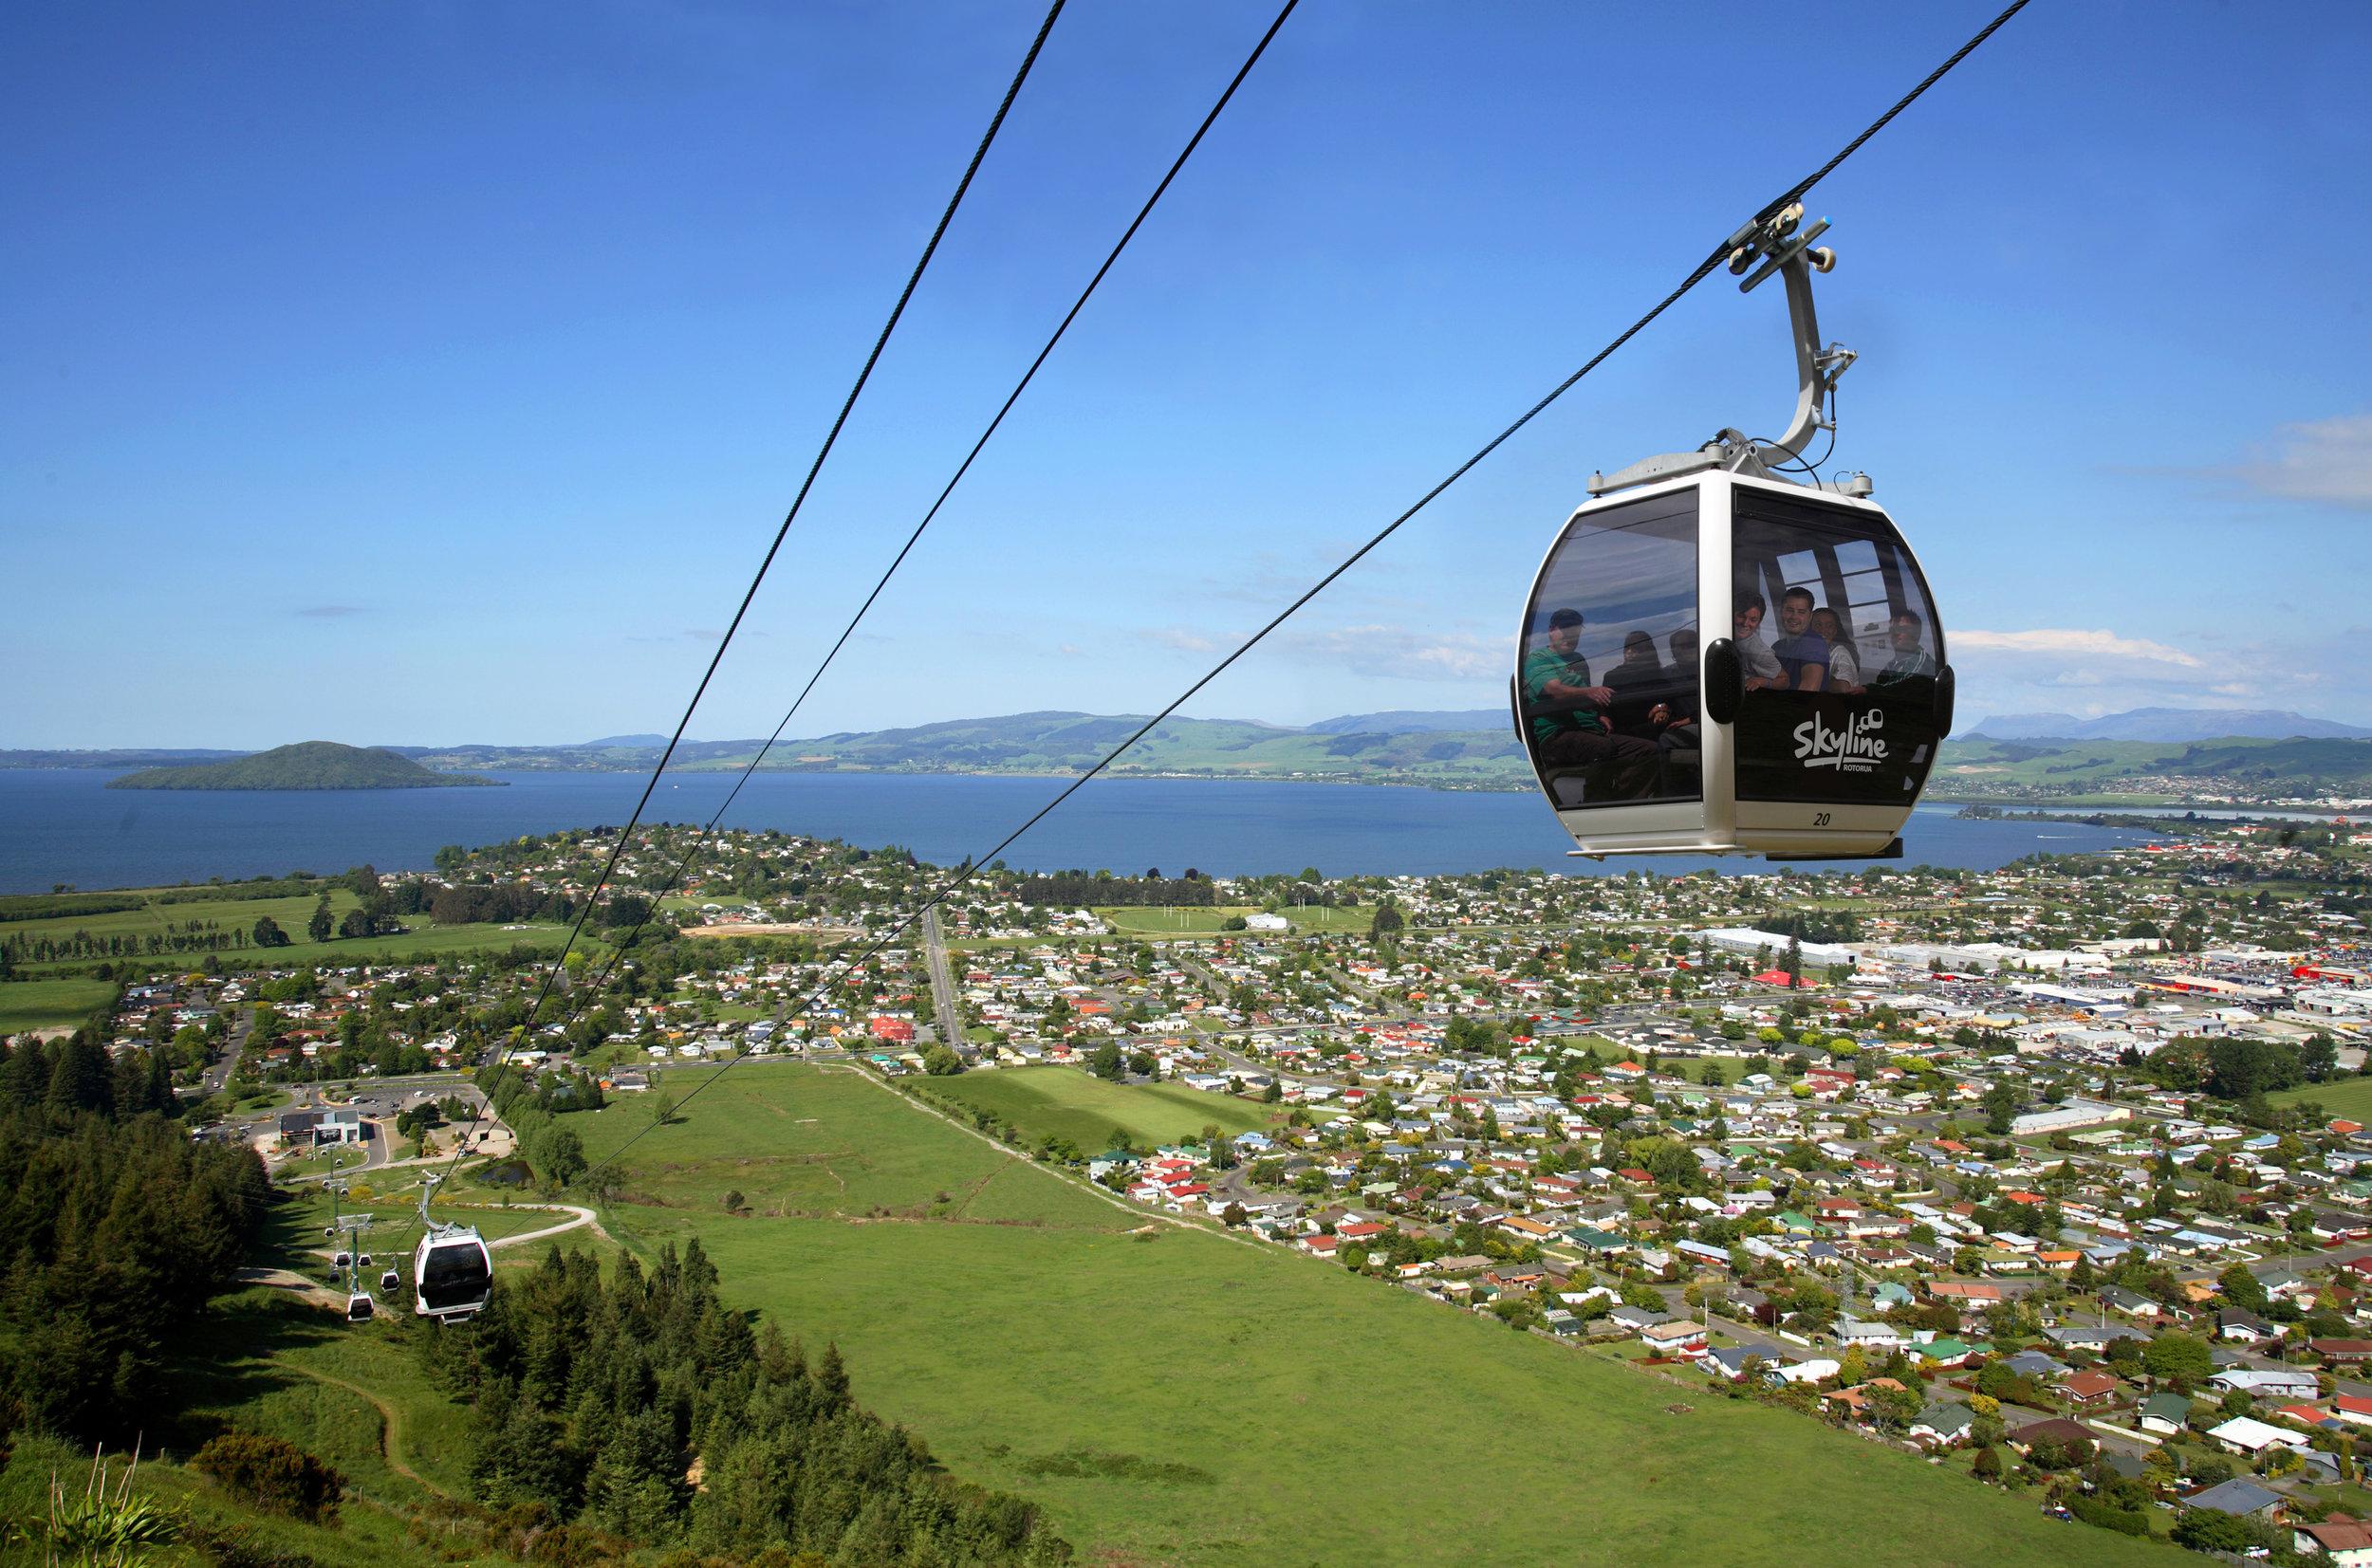 Rotorua Wonderland & Adventure Tour - From $252 NZD per person